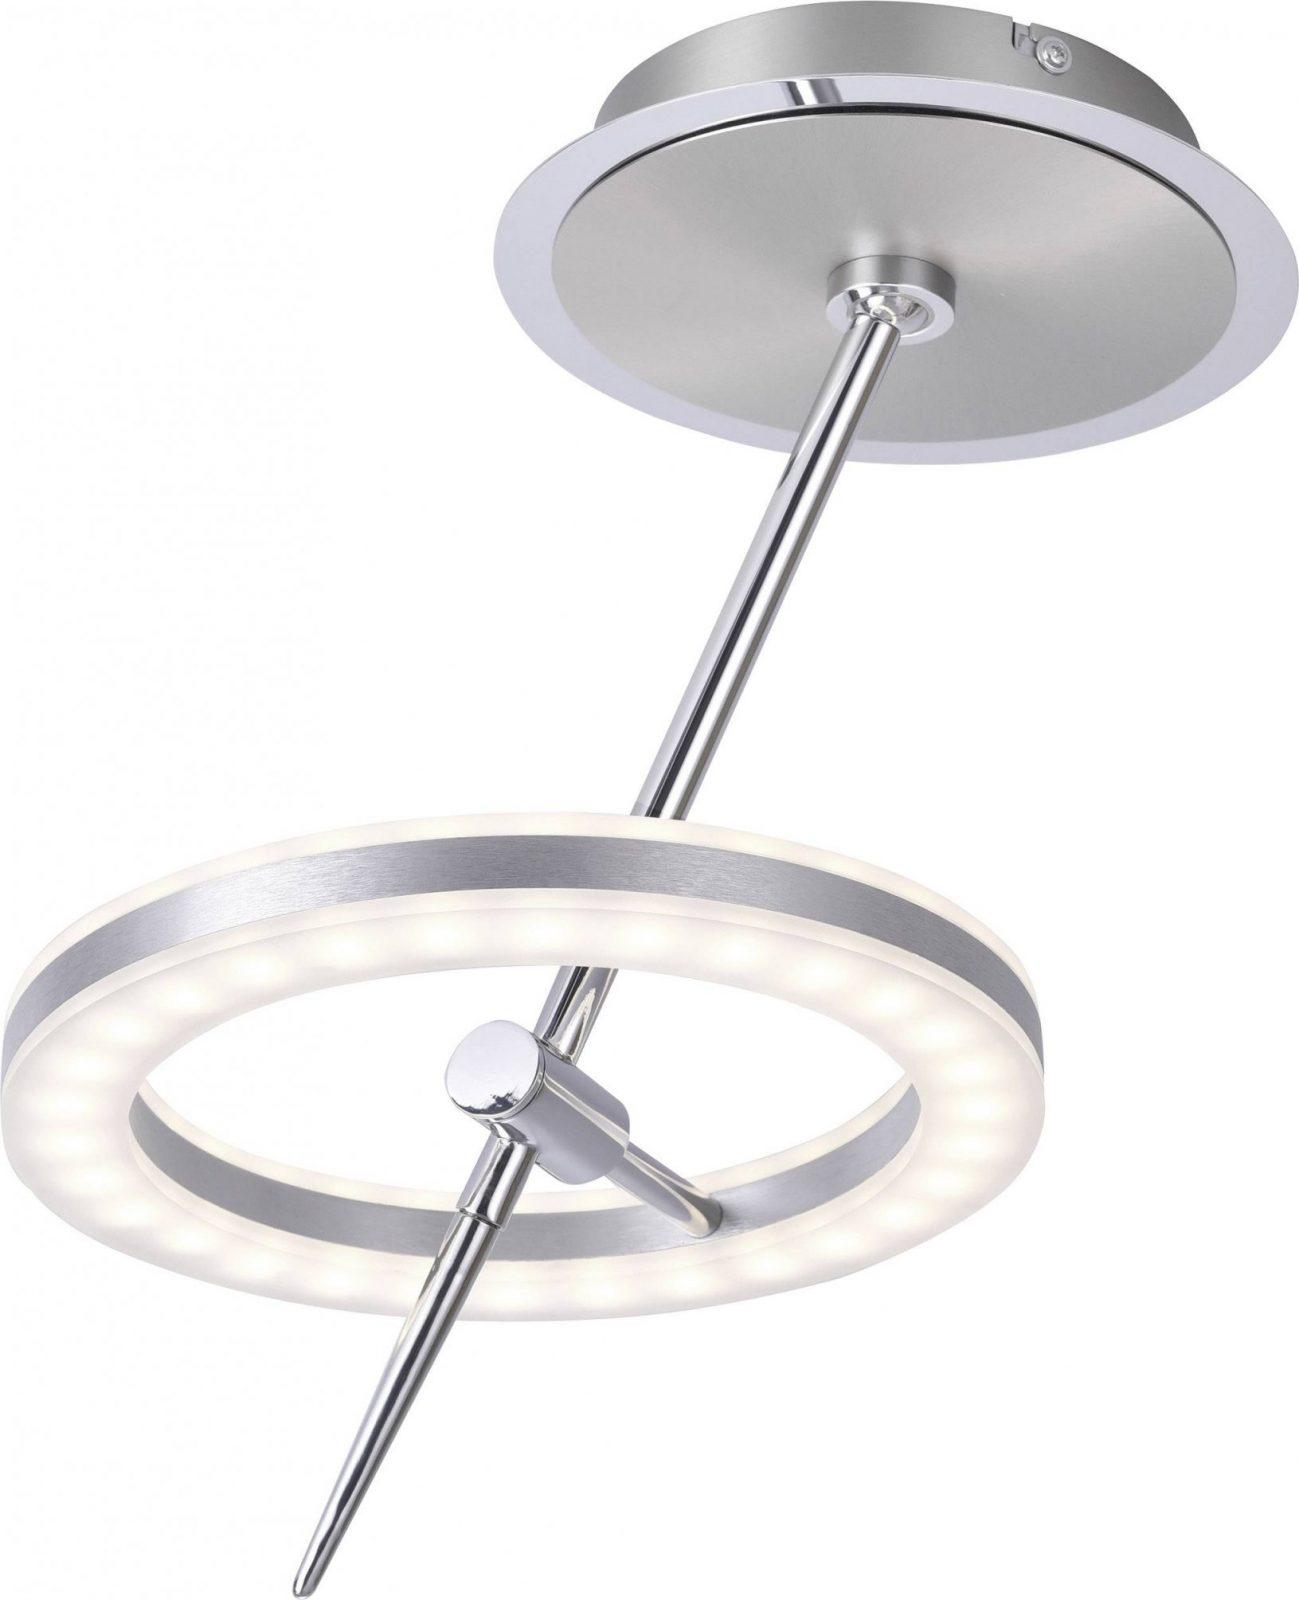 Paul Neuhaus Q® Ledplafond En Wandlamp Q®Amy Led Vast Ingebouwd von Lampen Von Paul Neuhaus Photo